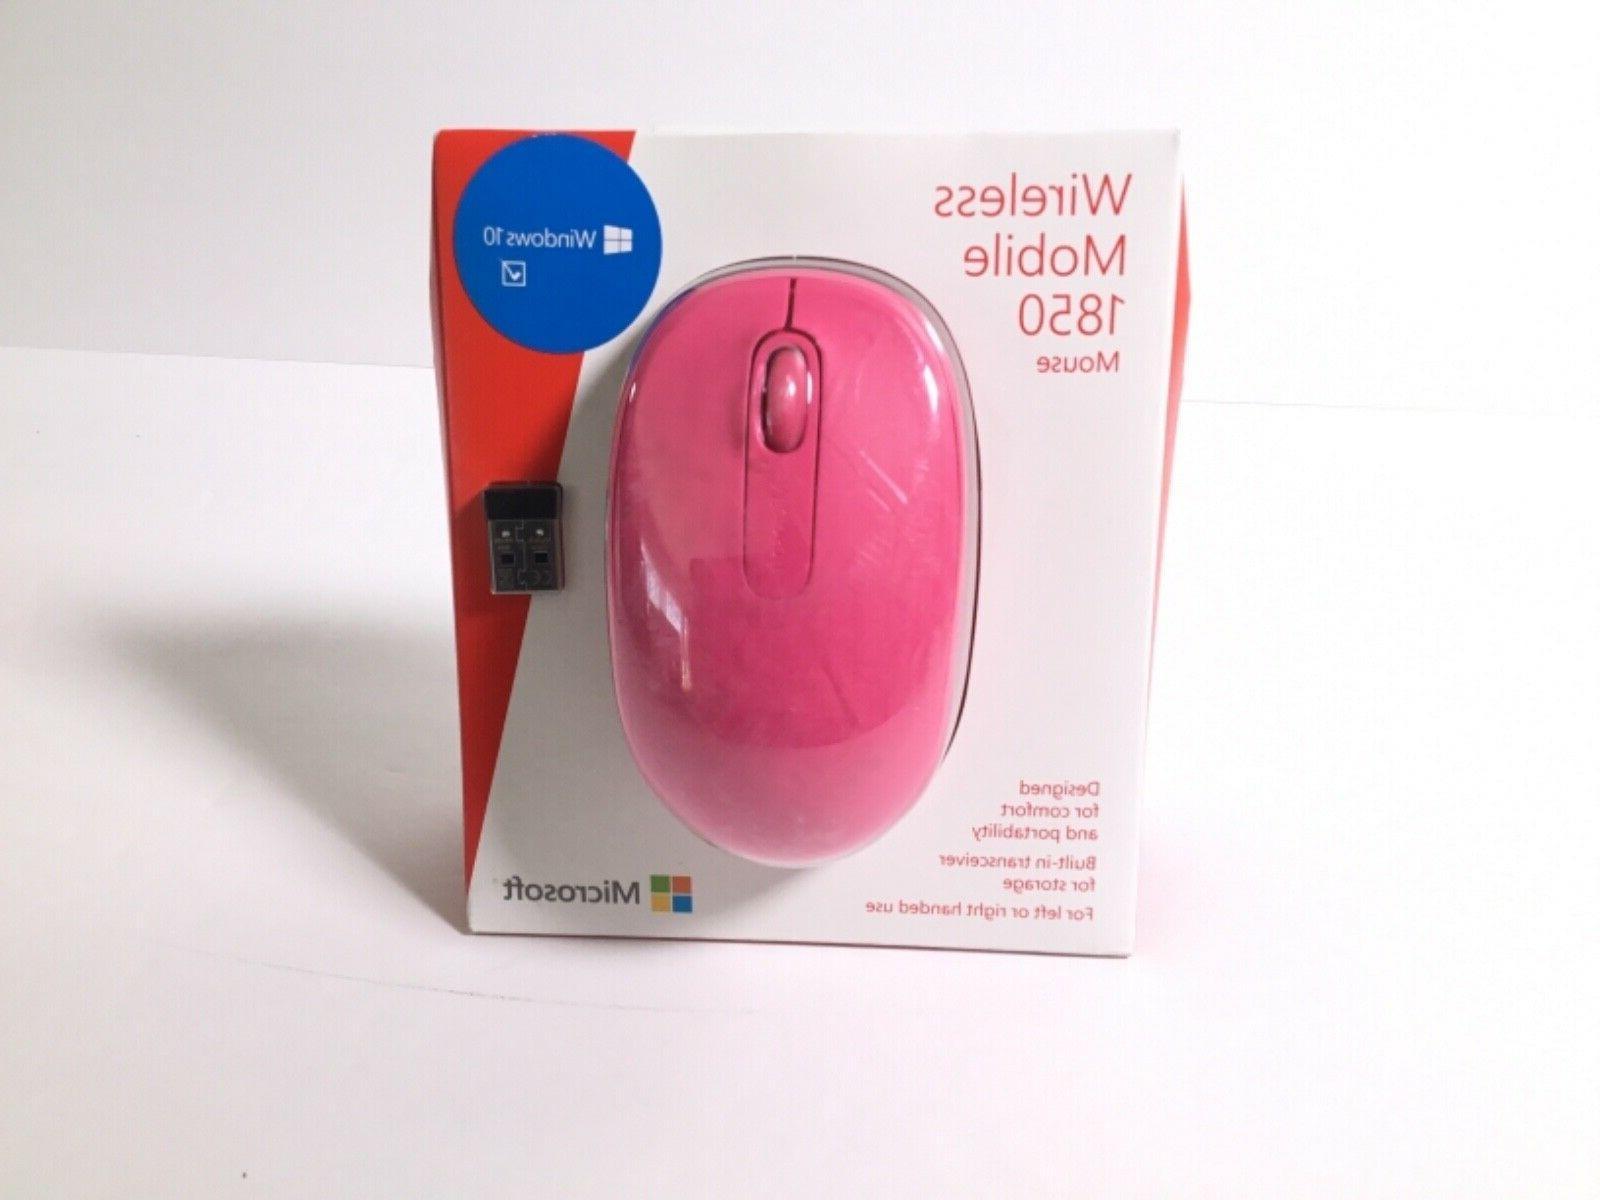 Microsoft Mobile1850 Cordless Receiver Mice